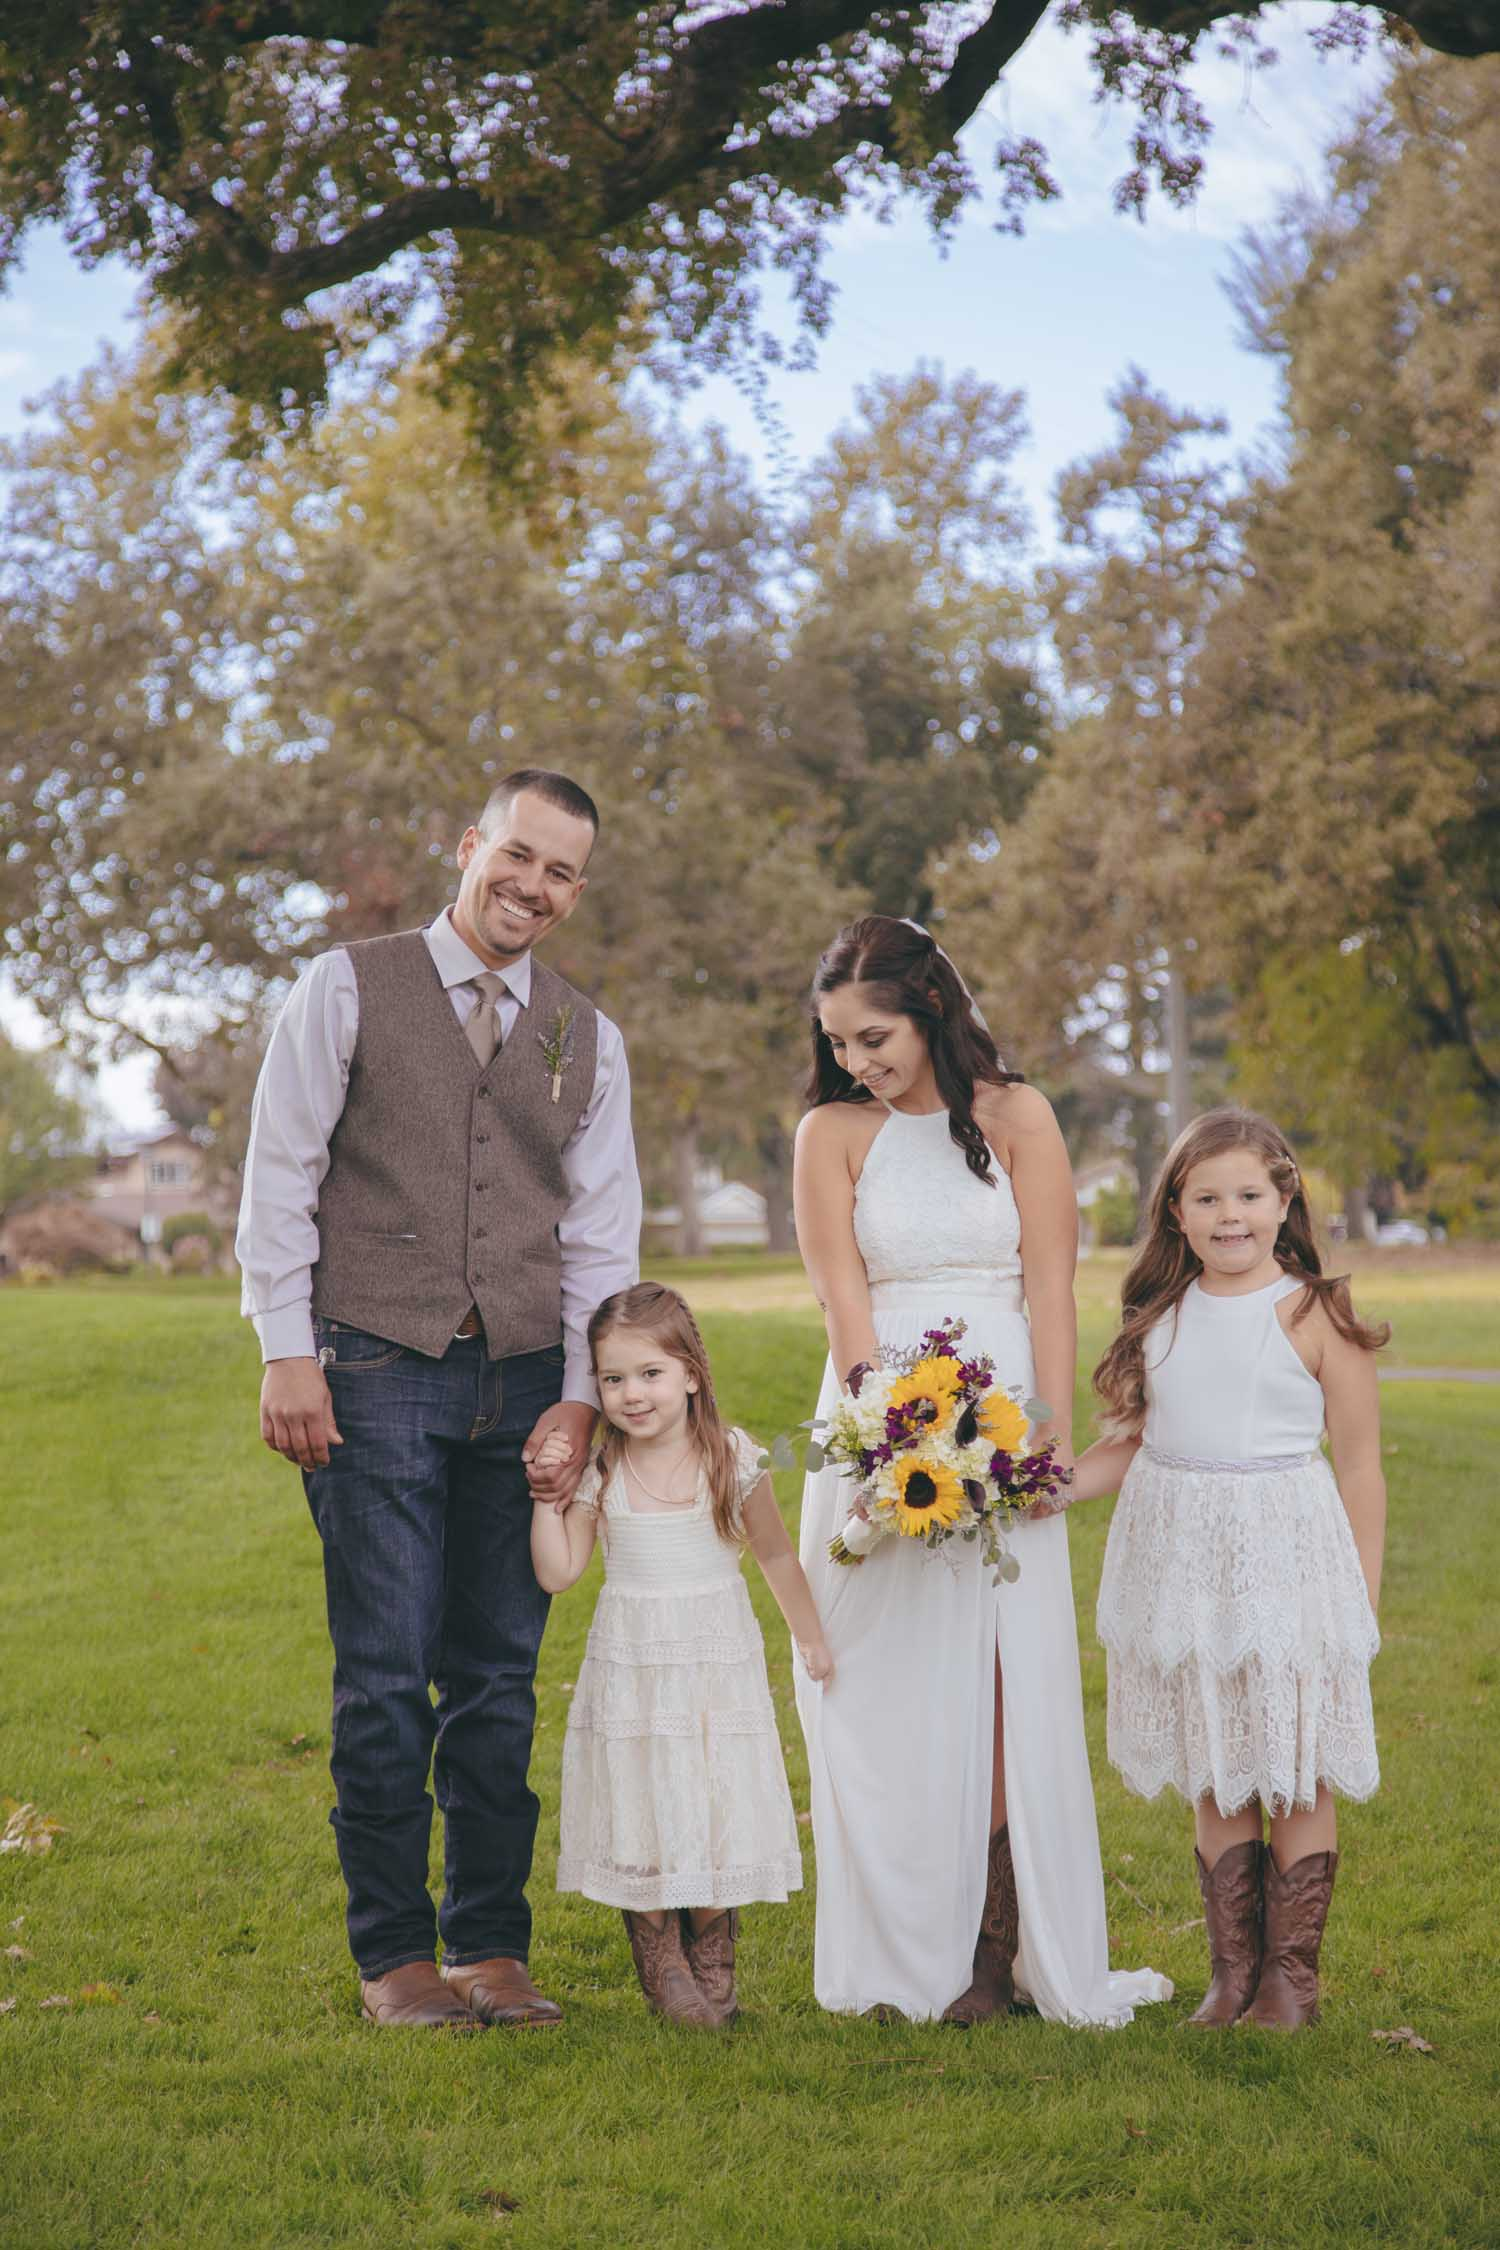 Bonnie-Scott-Rustic-Wedding-Chico-Ca-Butte-Creek-Country-Club143.jpg